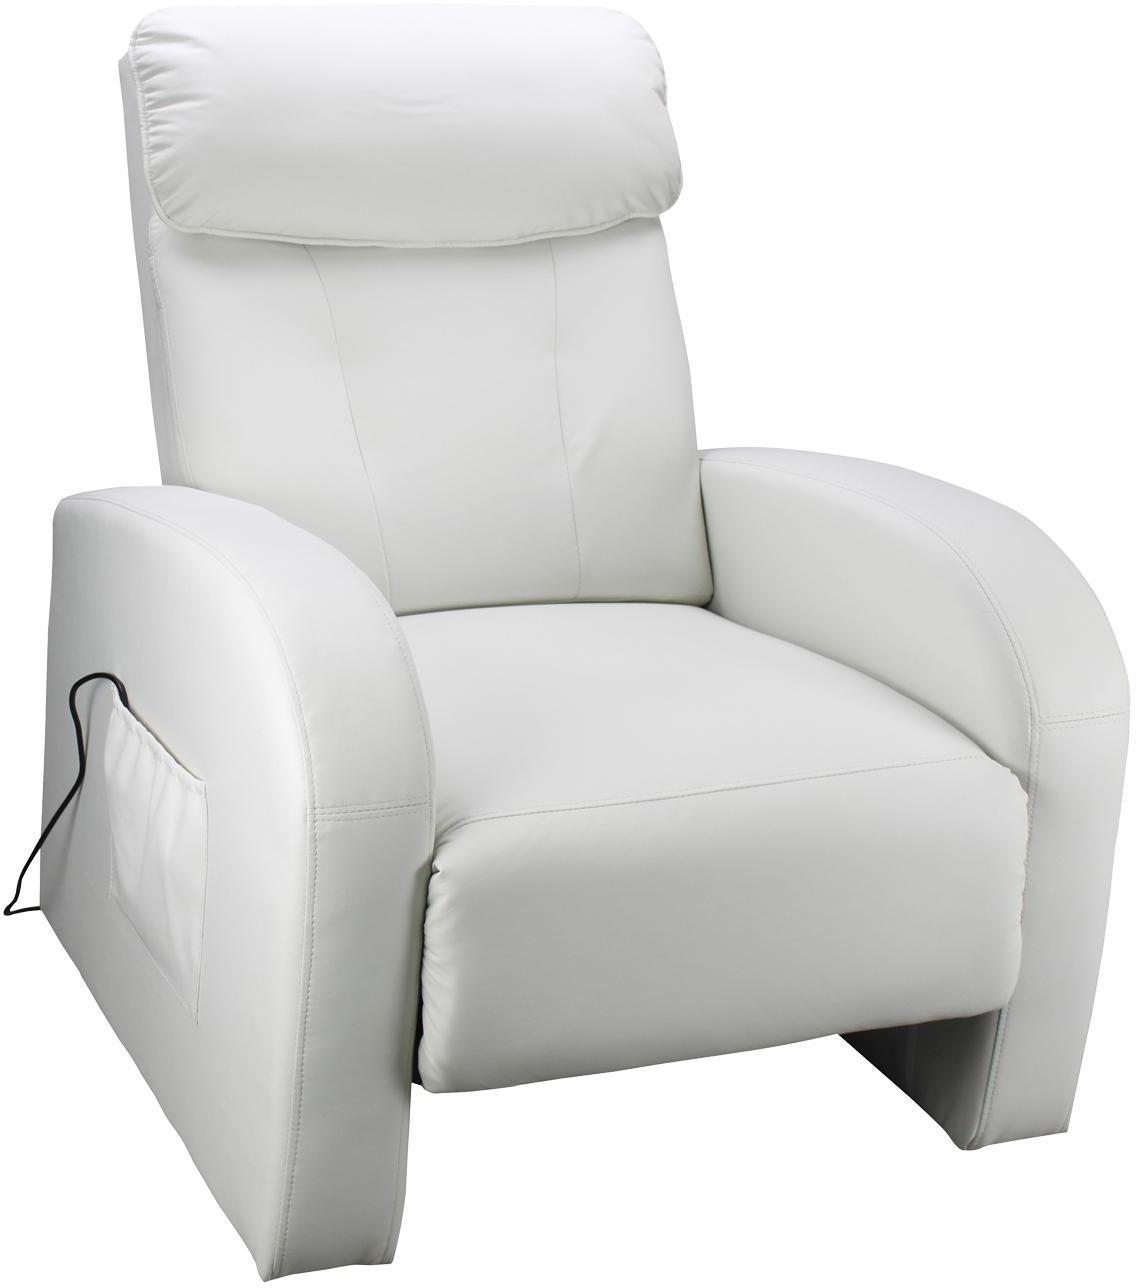 Masážné kreslo TOLEDO krémovo biele K70